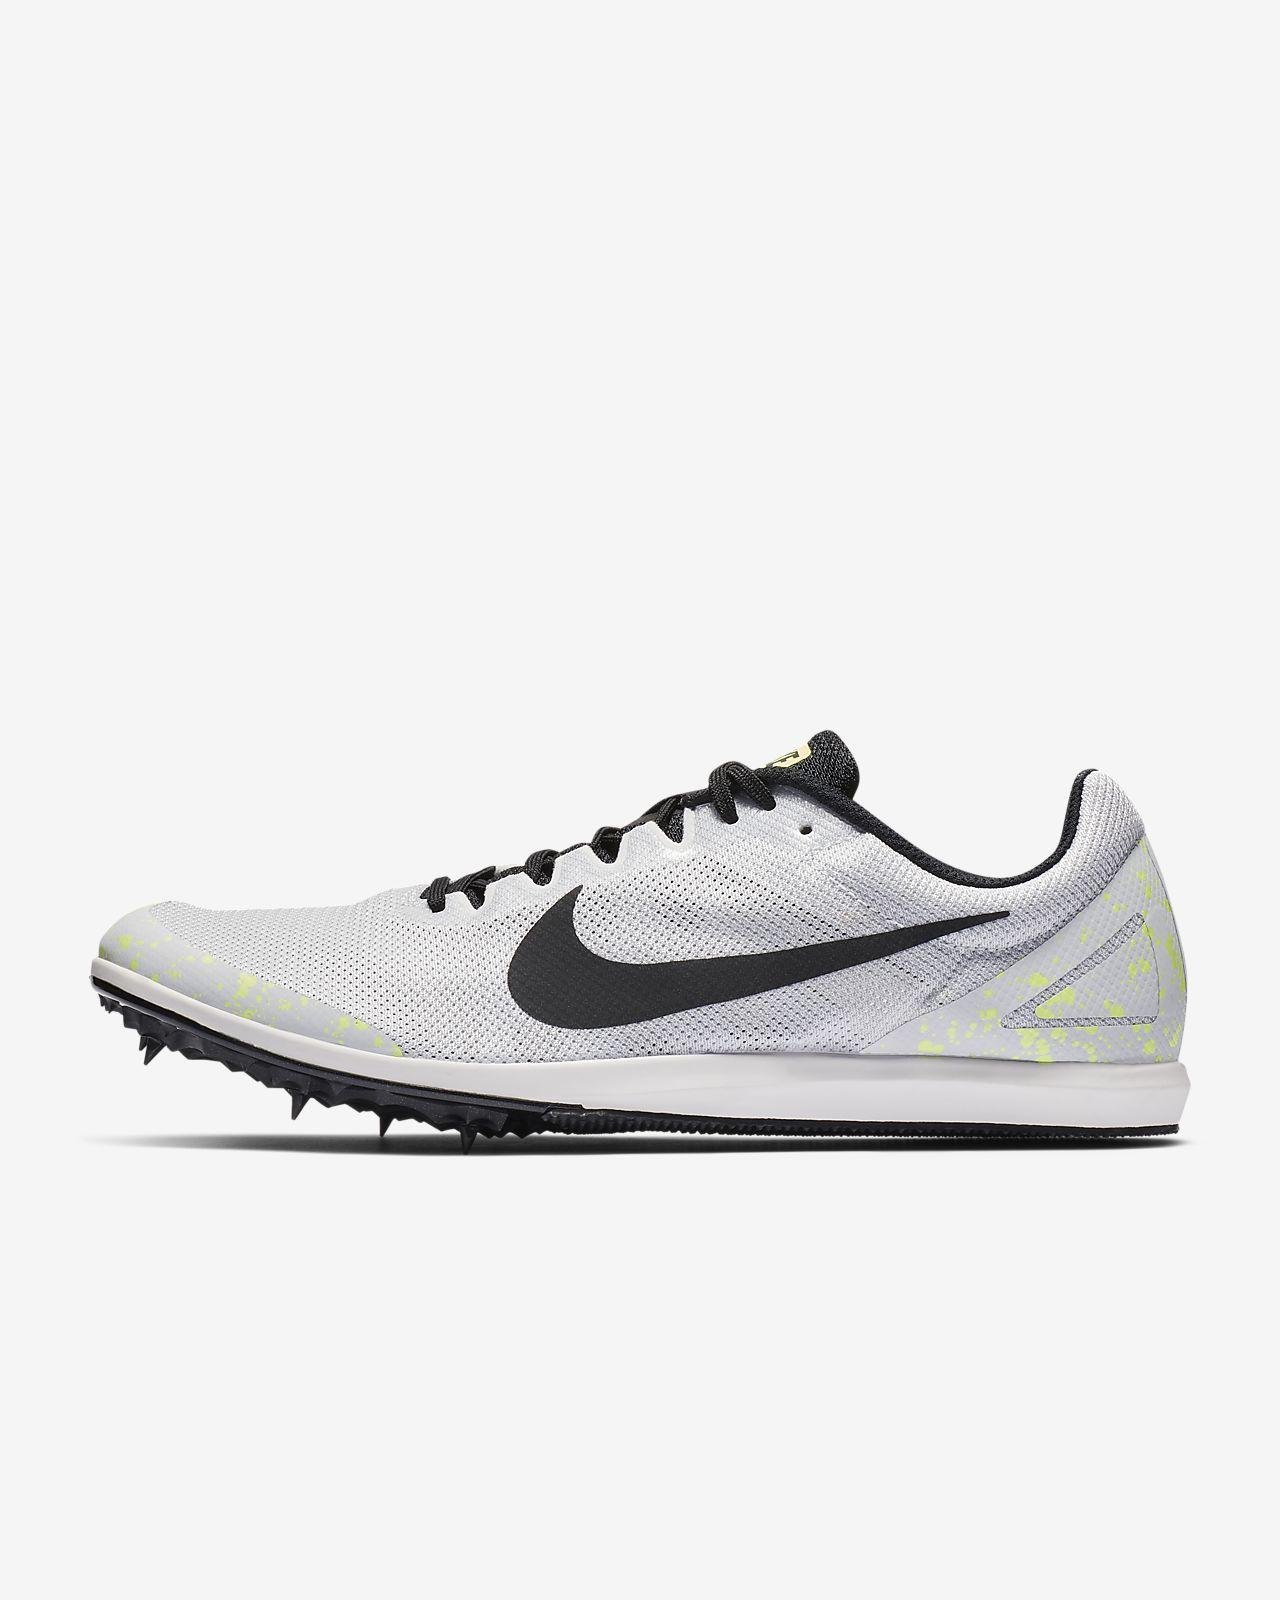 aceb6a22d18 Unisex παπούτσι στίβου Nike Zoom Rival D 10. Nike.com GR